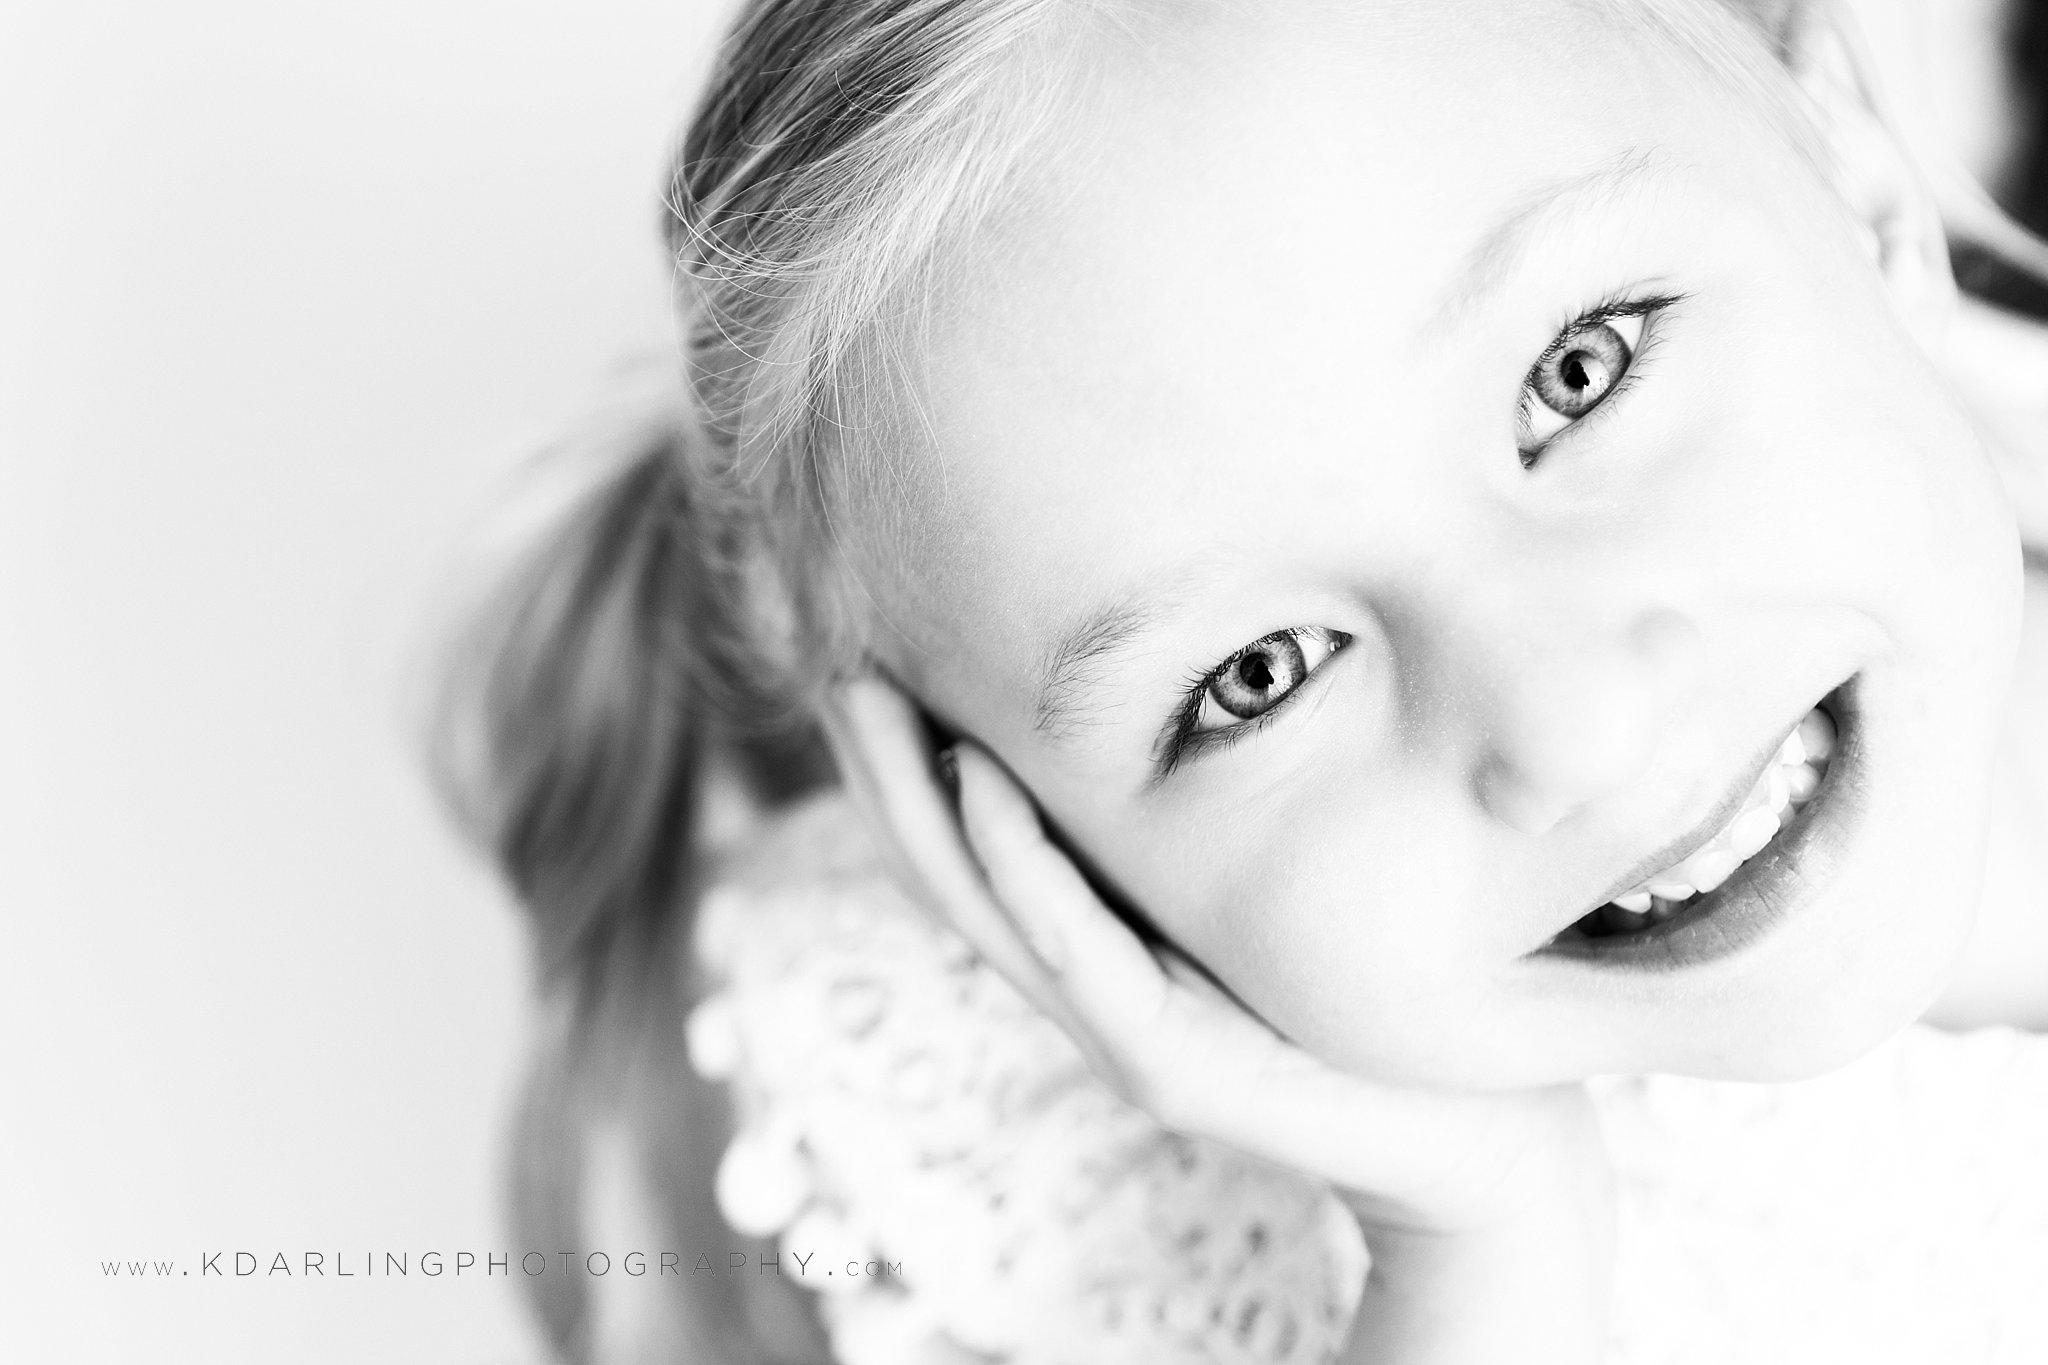 Child-Photographer-portraits-Champaign-County-IL-Fisher-Studio-Darling_0185.jpg